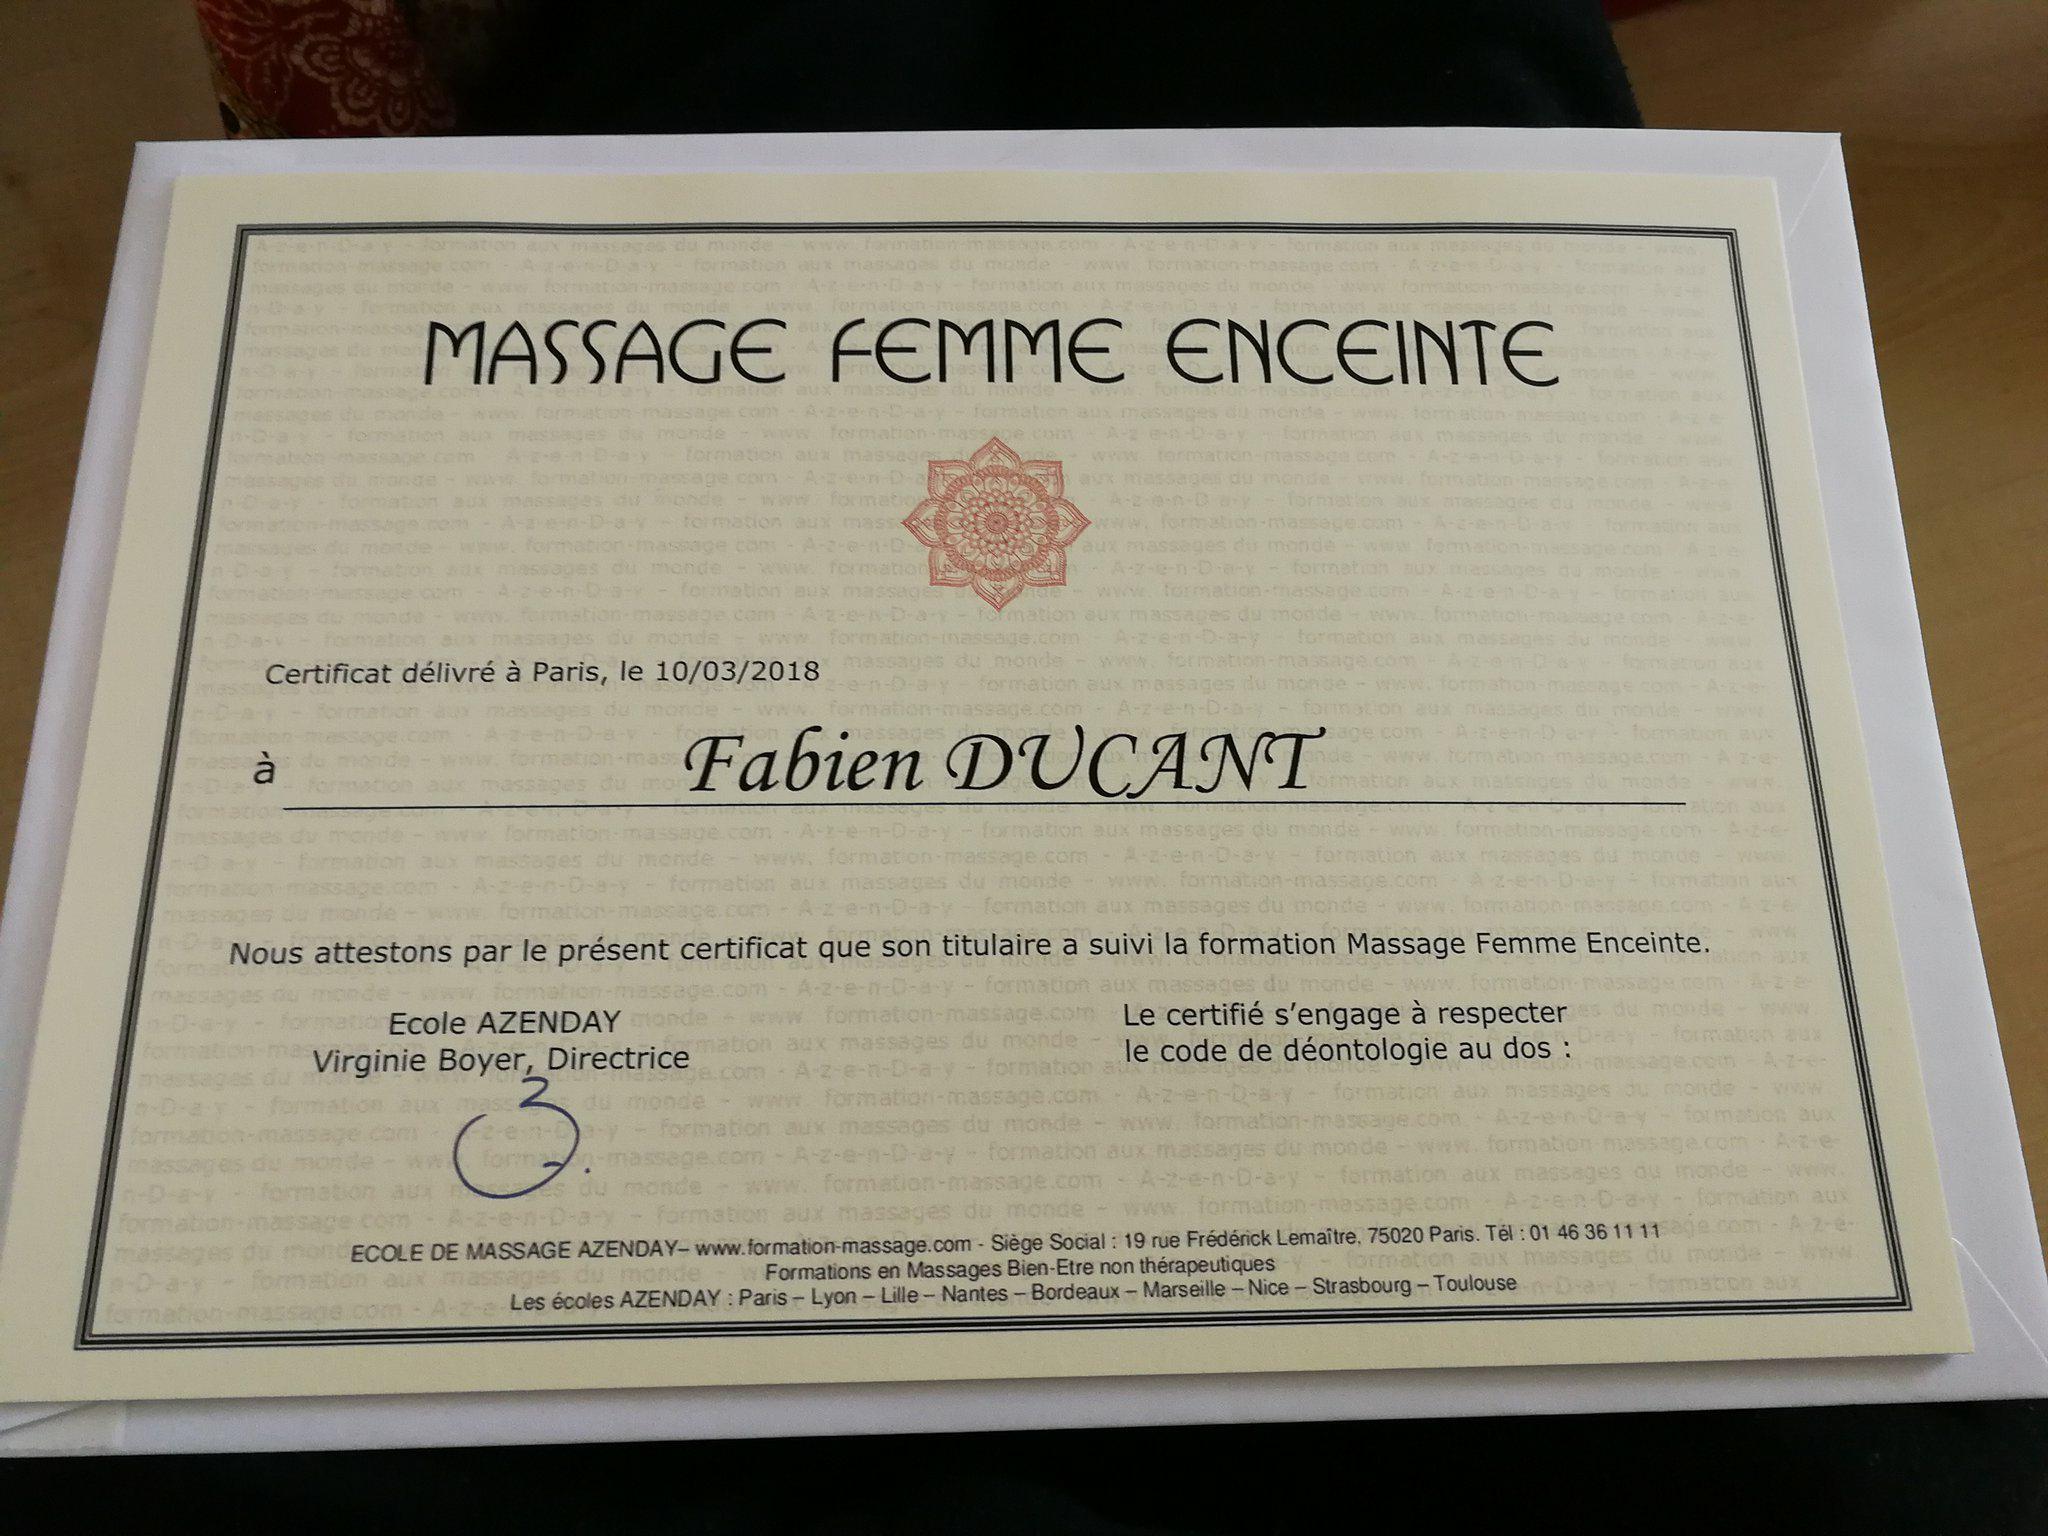 massage femme enceinte Valenciennes